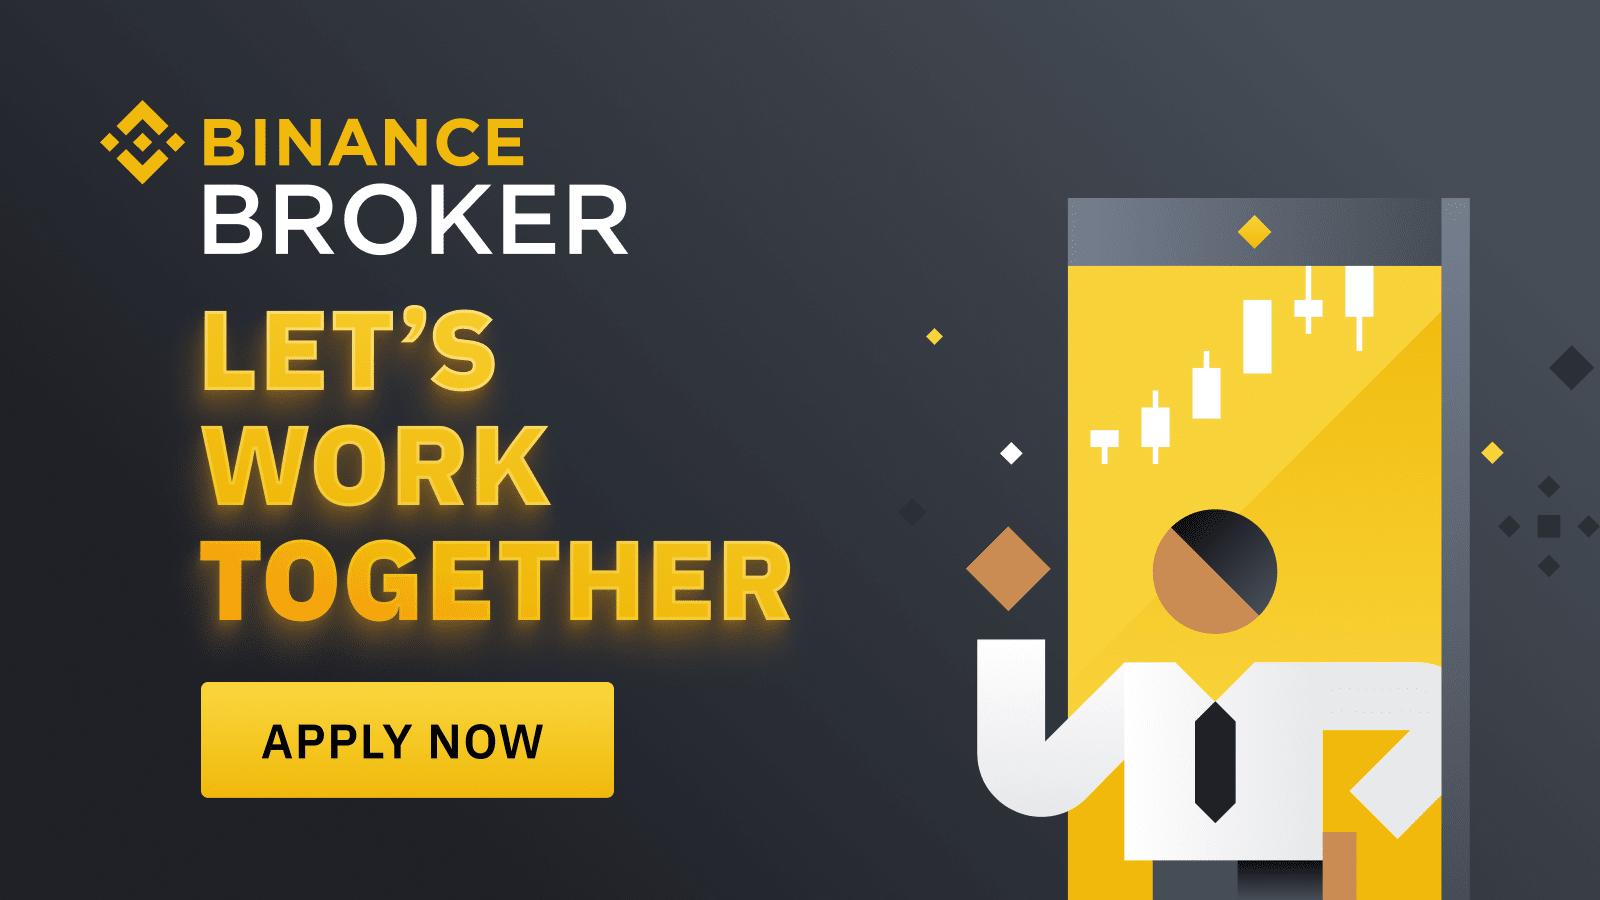 Binance Broker Spotlight: How Entrepreneurs Leverage Binance to Grow Their Own PlatformsCryptocurrency Trading Signals, Strategies & Templates | DexStrats